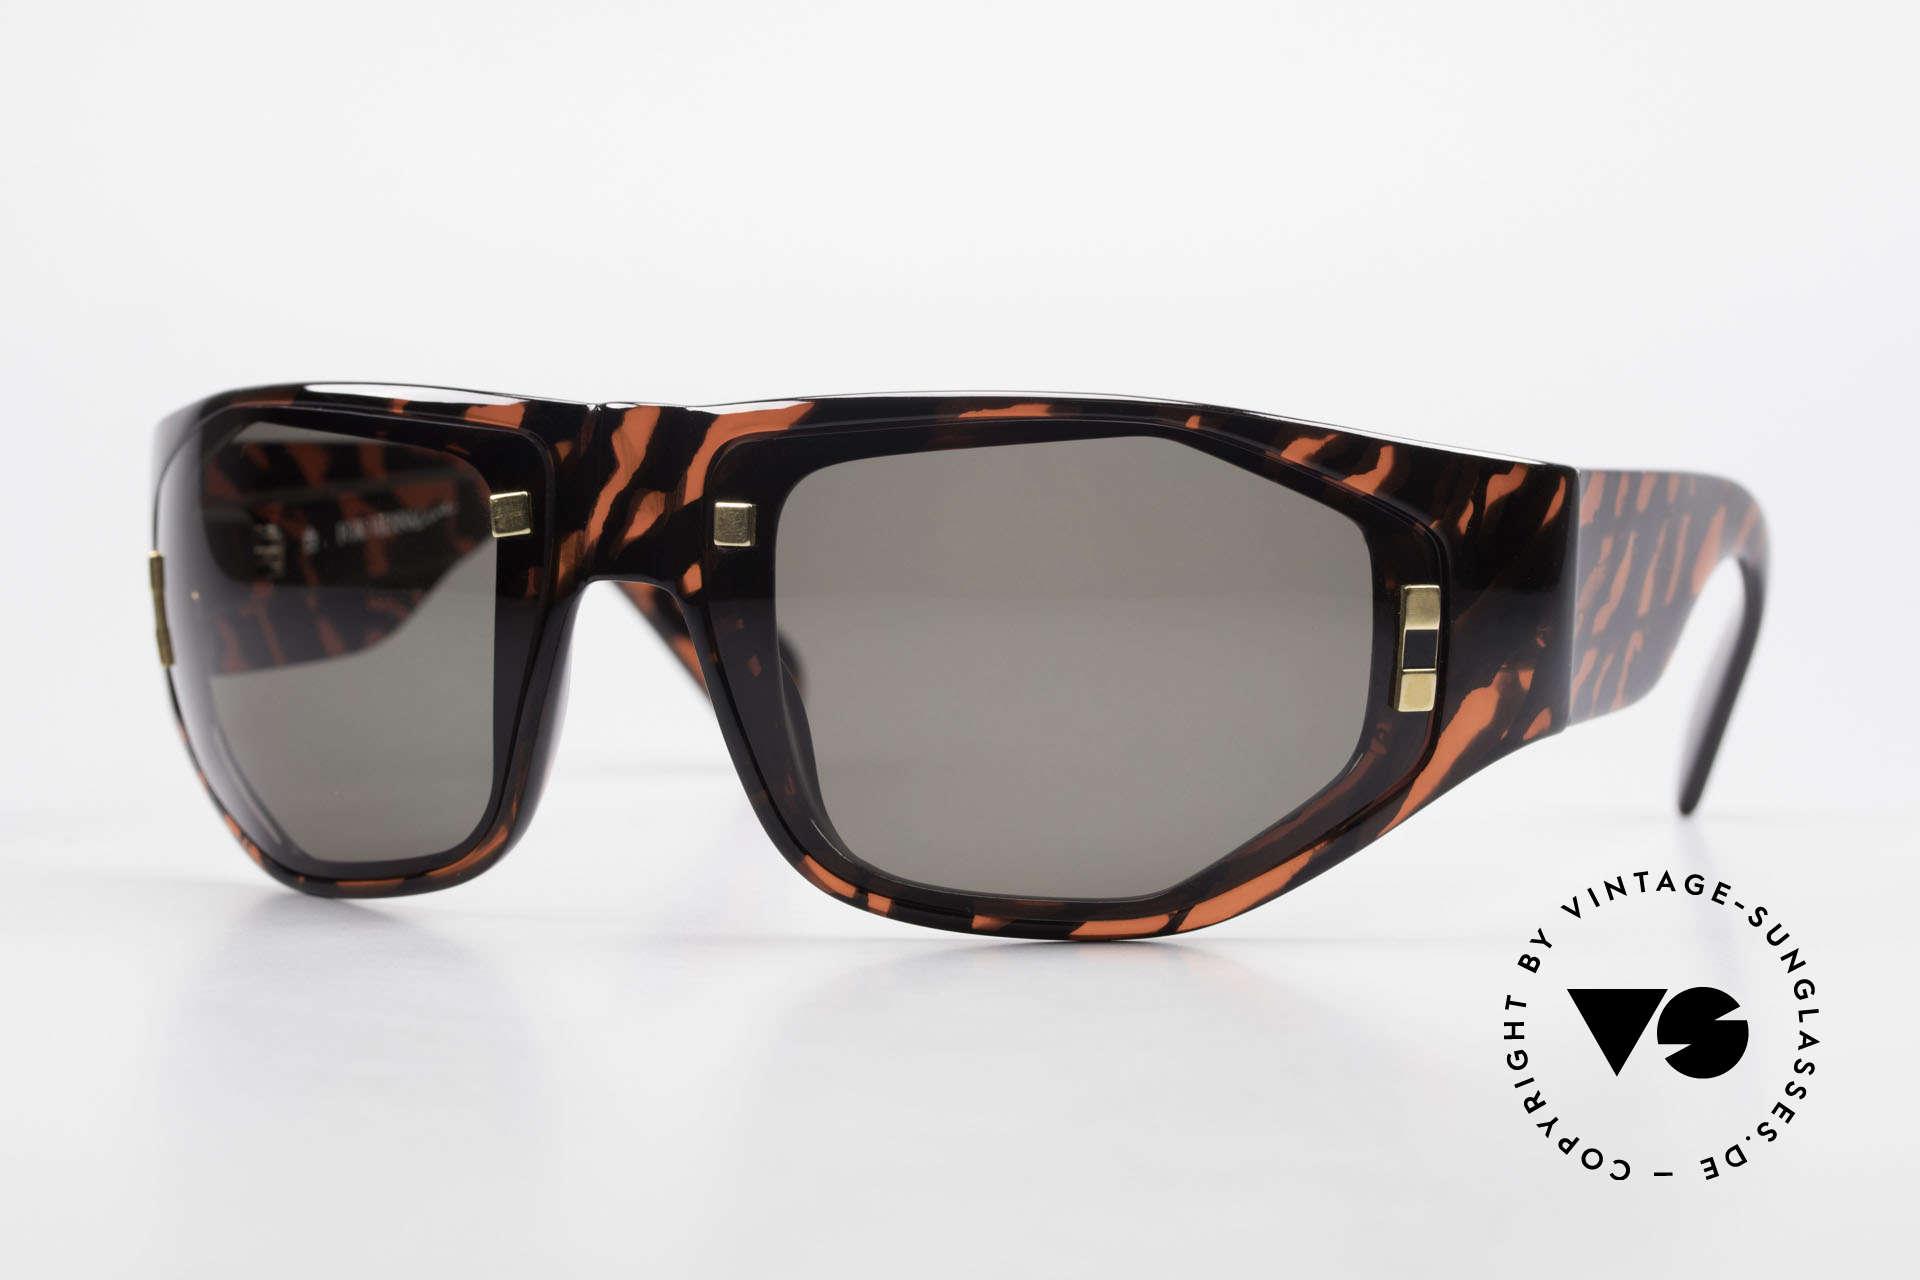 Paloma Picasso 3701 90's Wrap Sunglasses Ladies, vintage ladies sunglasses by P. PICASSO from 1990, Made for Women